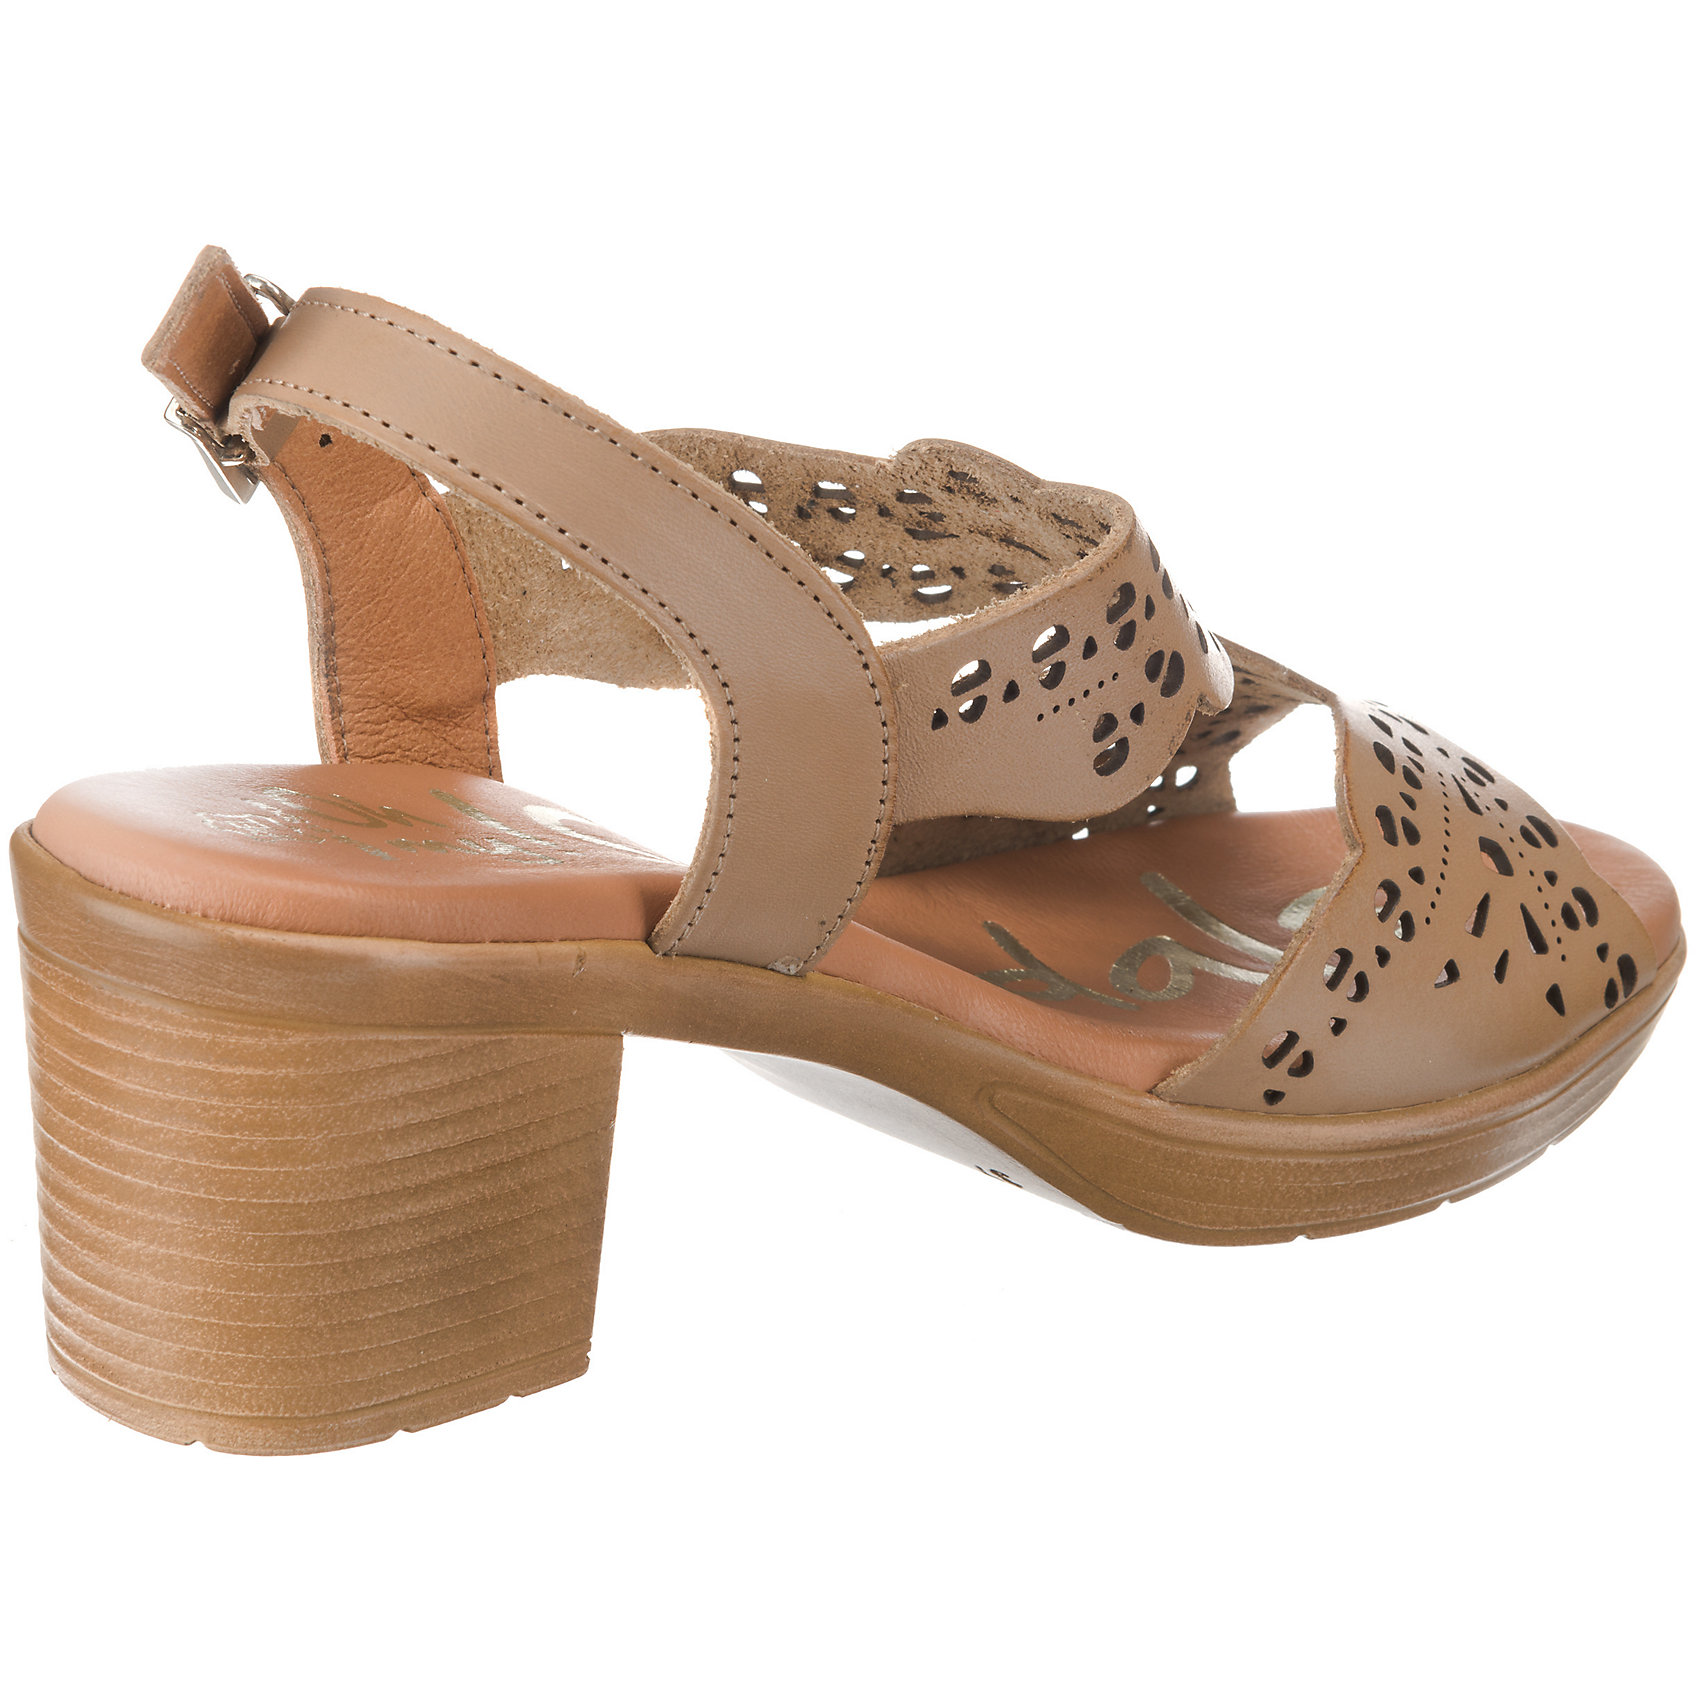 Neu Oh  my Sandales Sandales Sandales T-Steg-Sandalen 8284696 für Damen schwarz tabak 3c7875